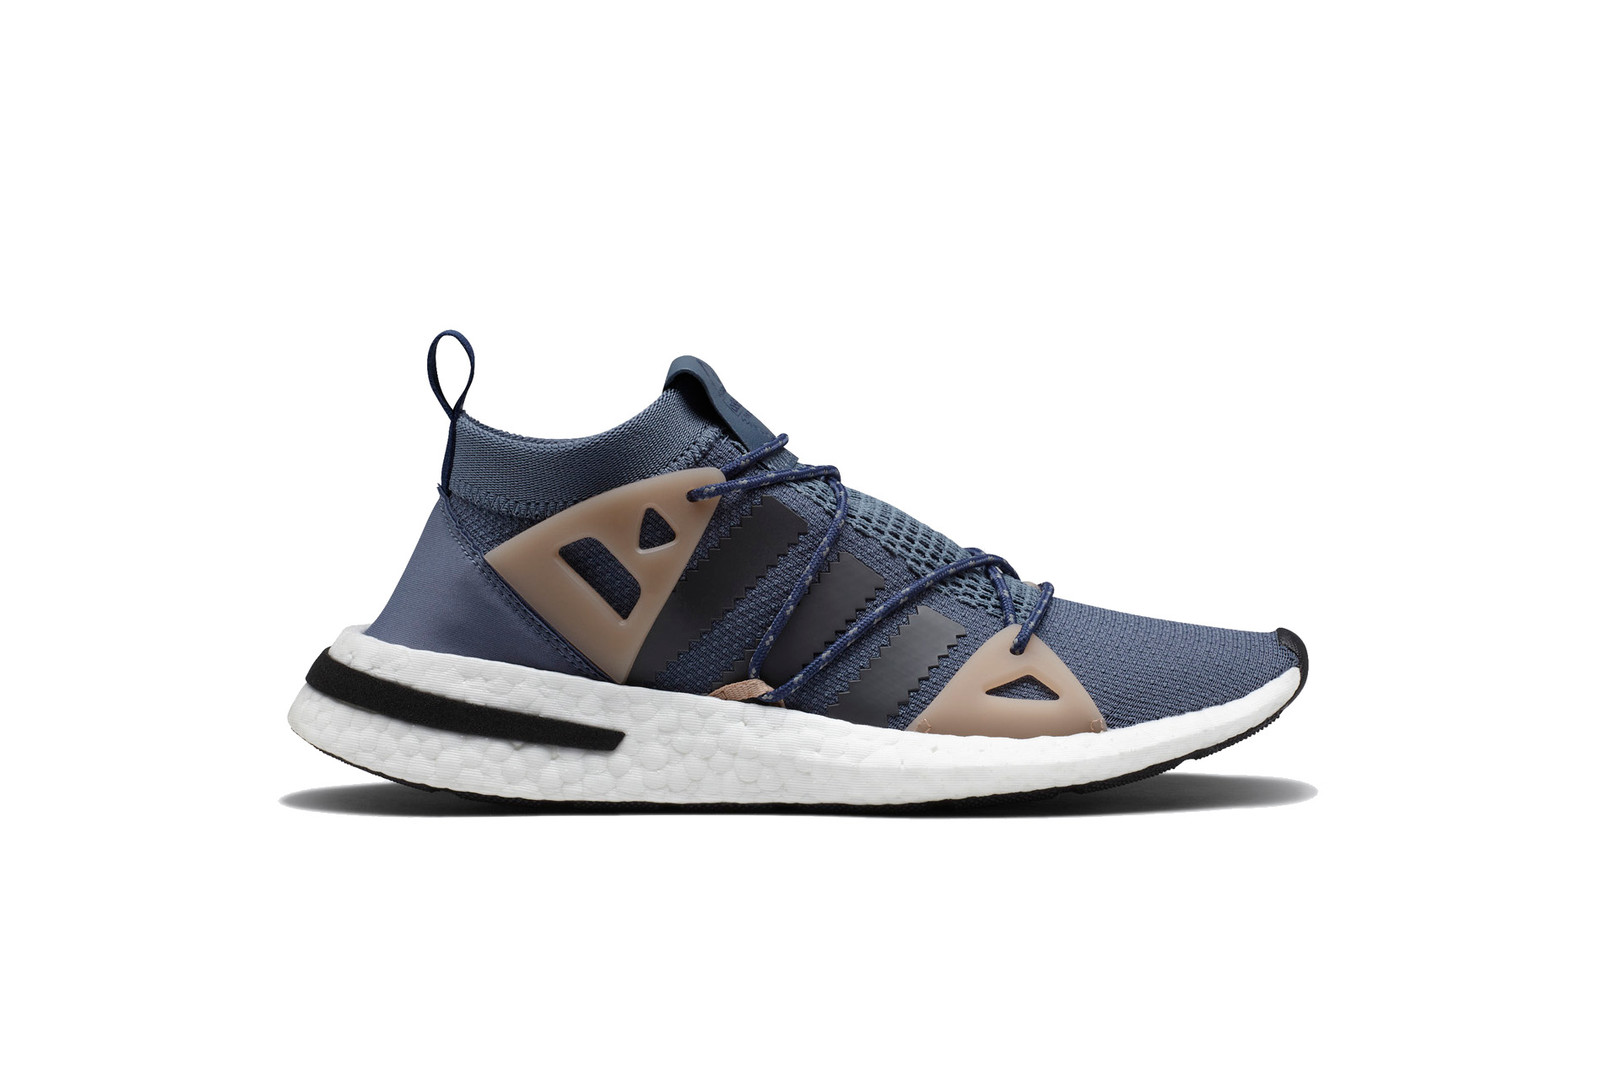 timeless design e00aa 89b6e Kendall Jenner adidas Originals ARKYN Sneaker Campaign Footwear Sportswear  New Silhouette